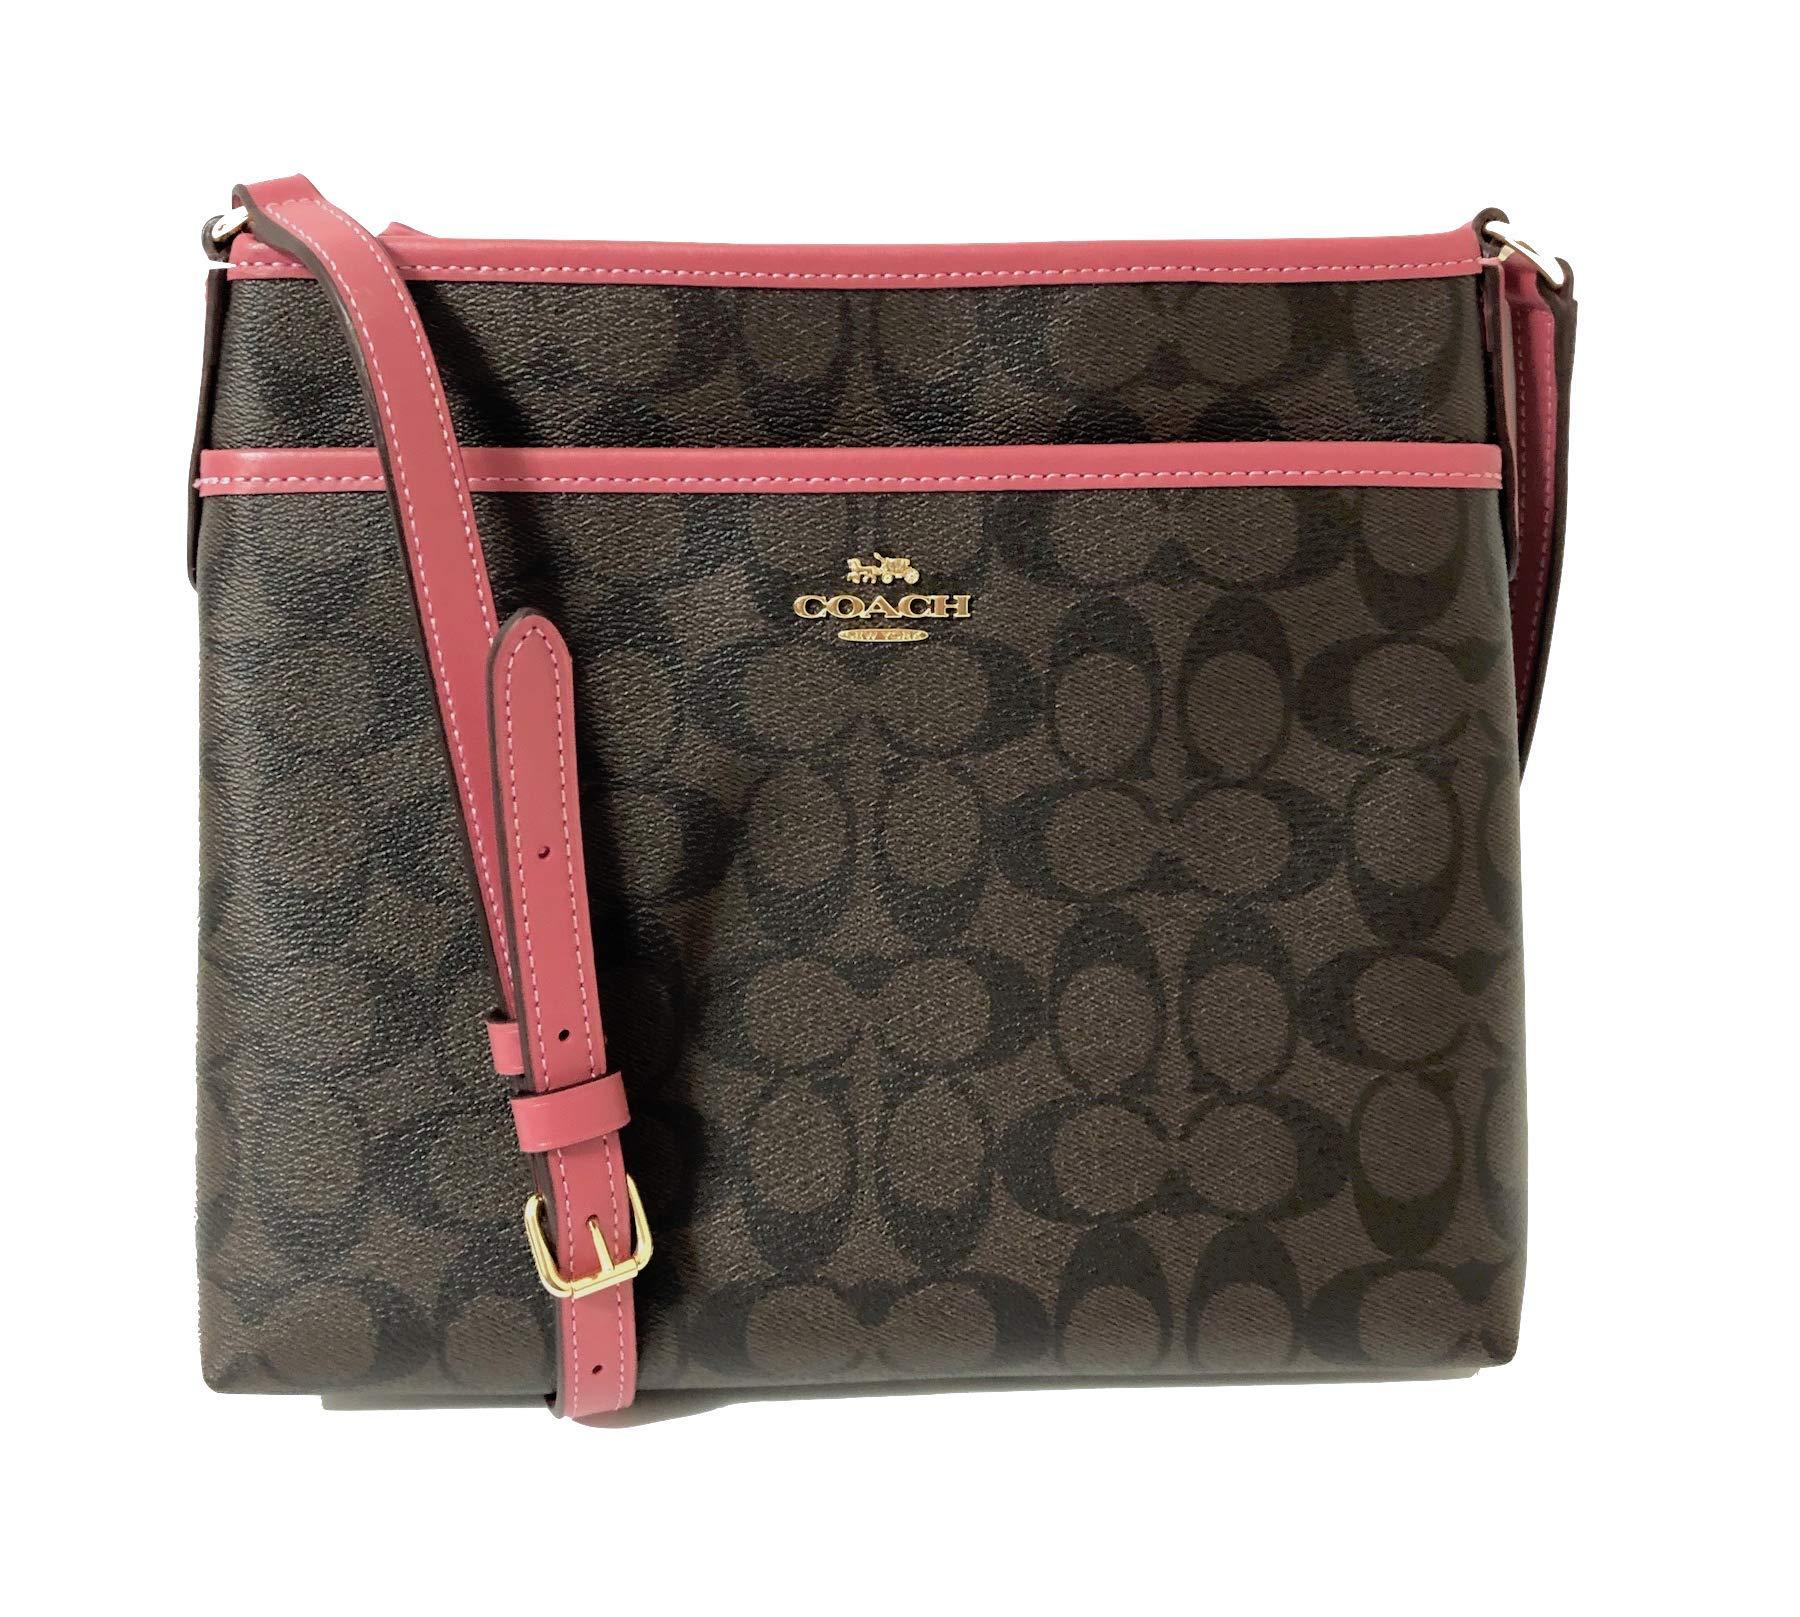 Coach Signature Zip File Crossbody Bag (IM/Brown Strawberry)